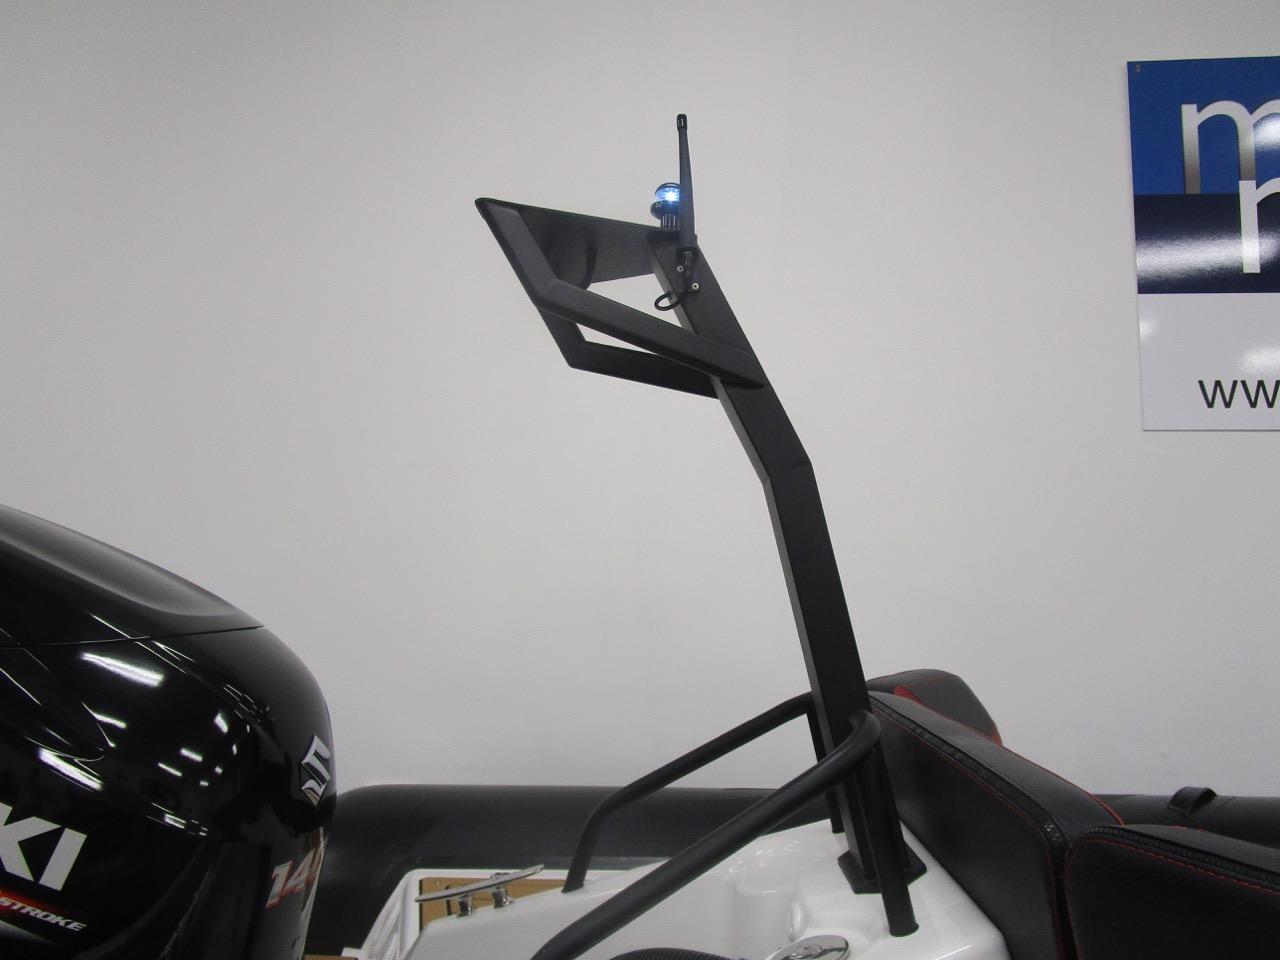 GRAND DRIVE D600 RIB ski tower and lights